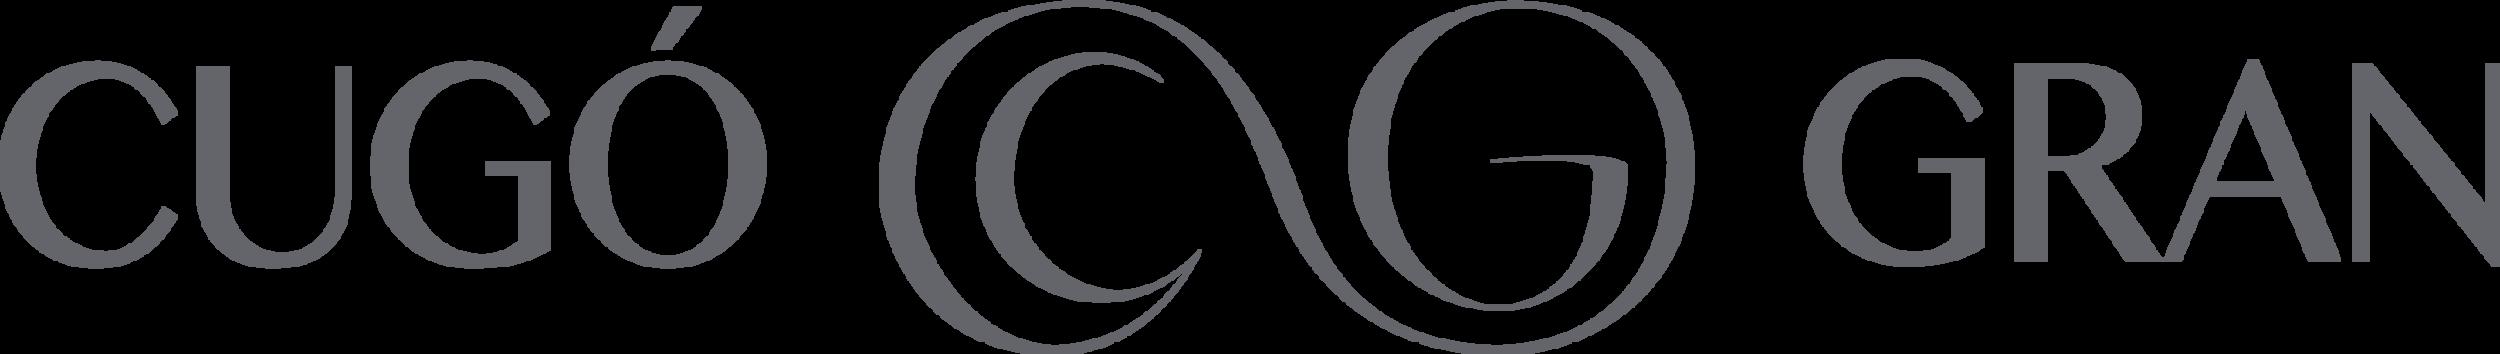 Cugo Gran Logo_CLOSER-CROP.png